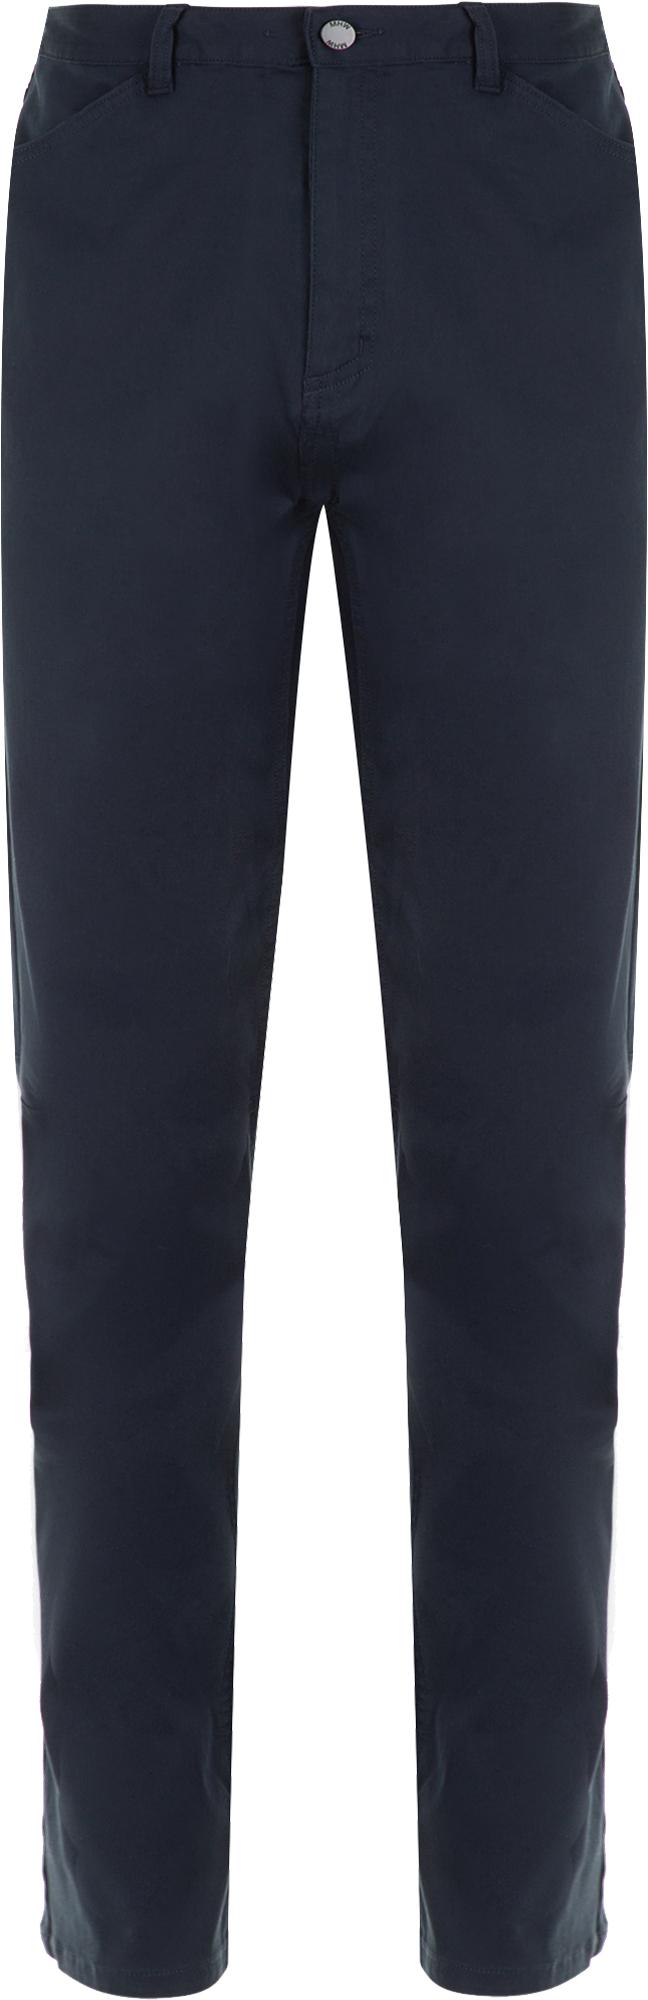 Mountain Hardwear Брюки мужские Mountain Hardwear Kentro Cord™, размер 56